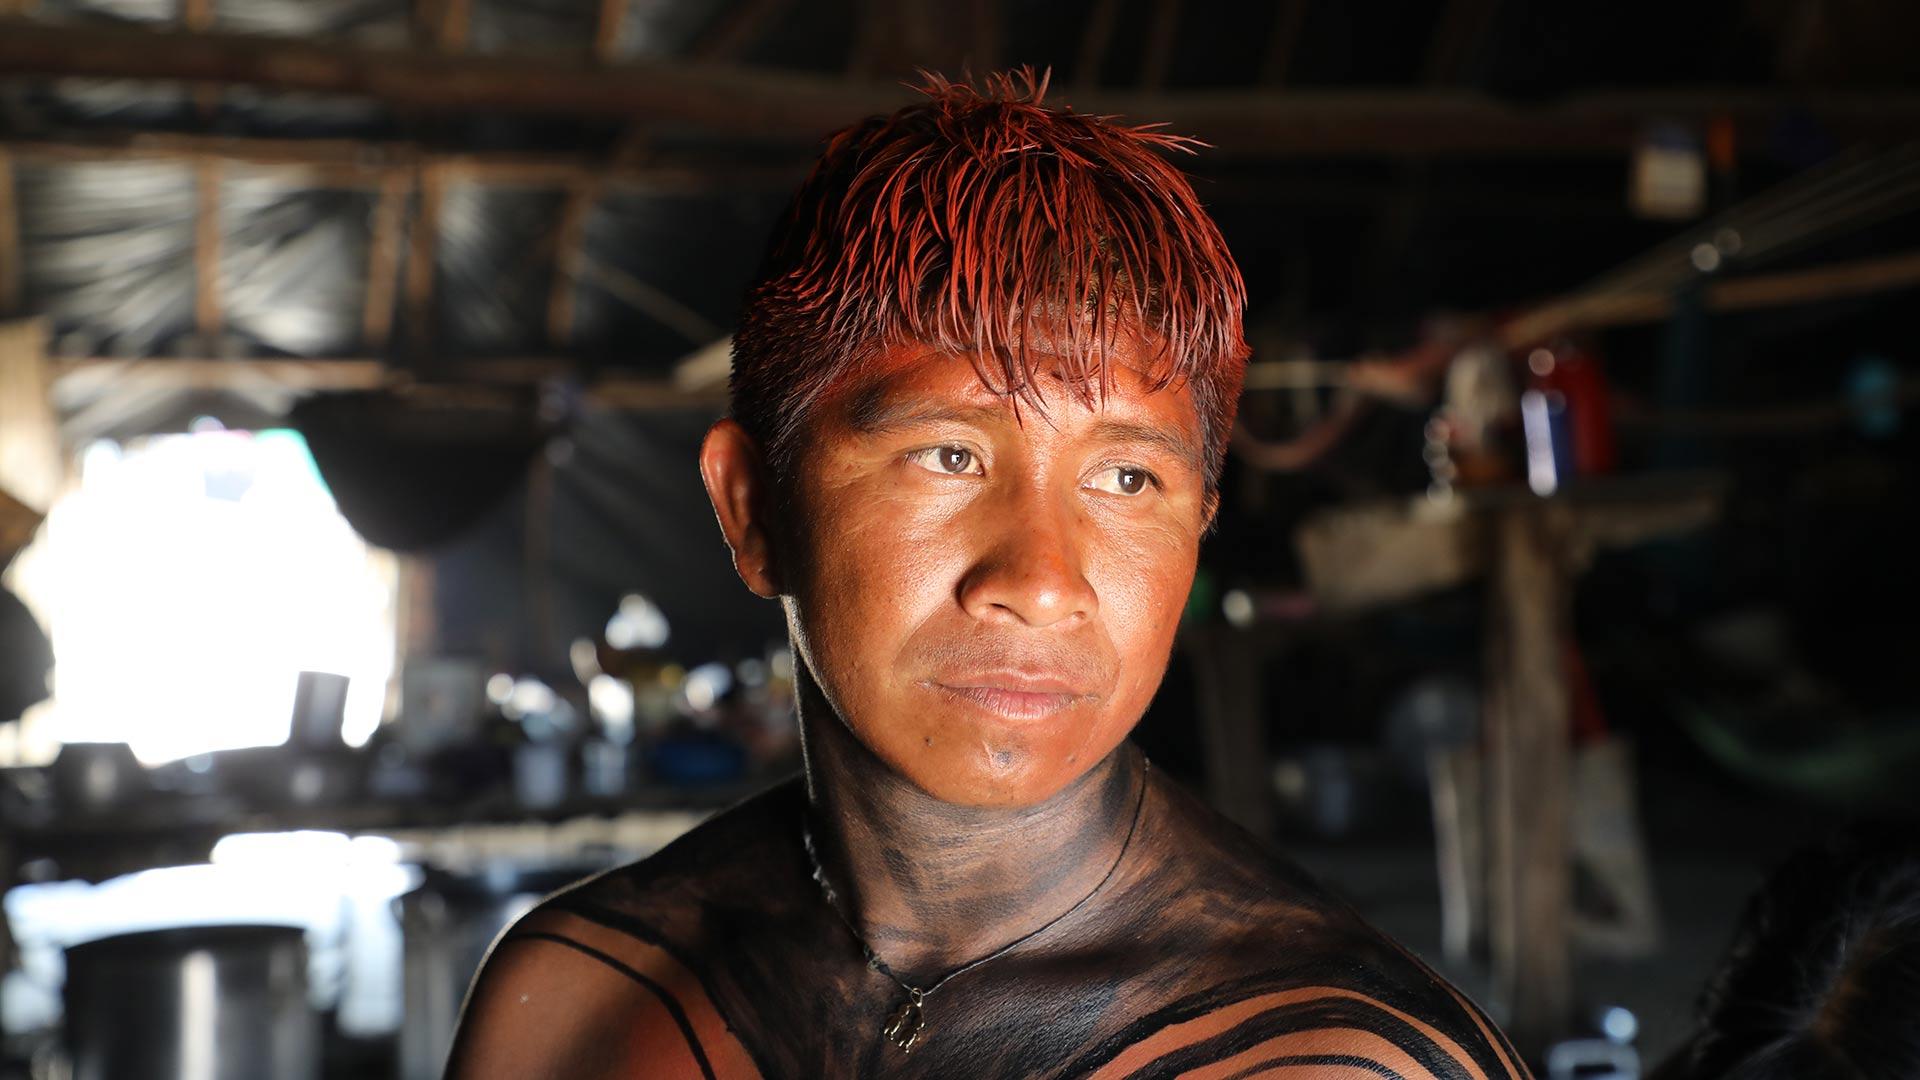 Kotoc in attire for feast in honor of the parrot spirit, Xingu, Brazil.